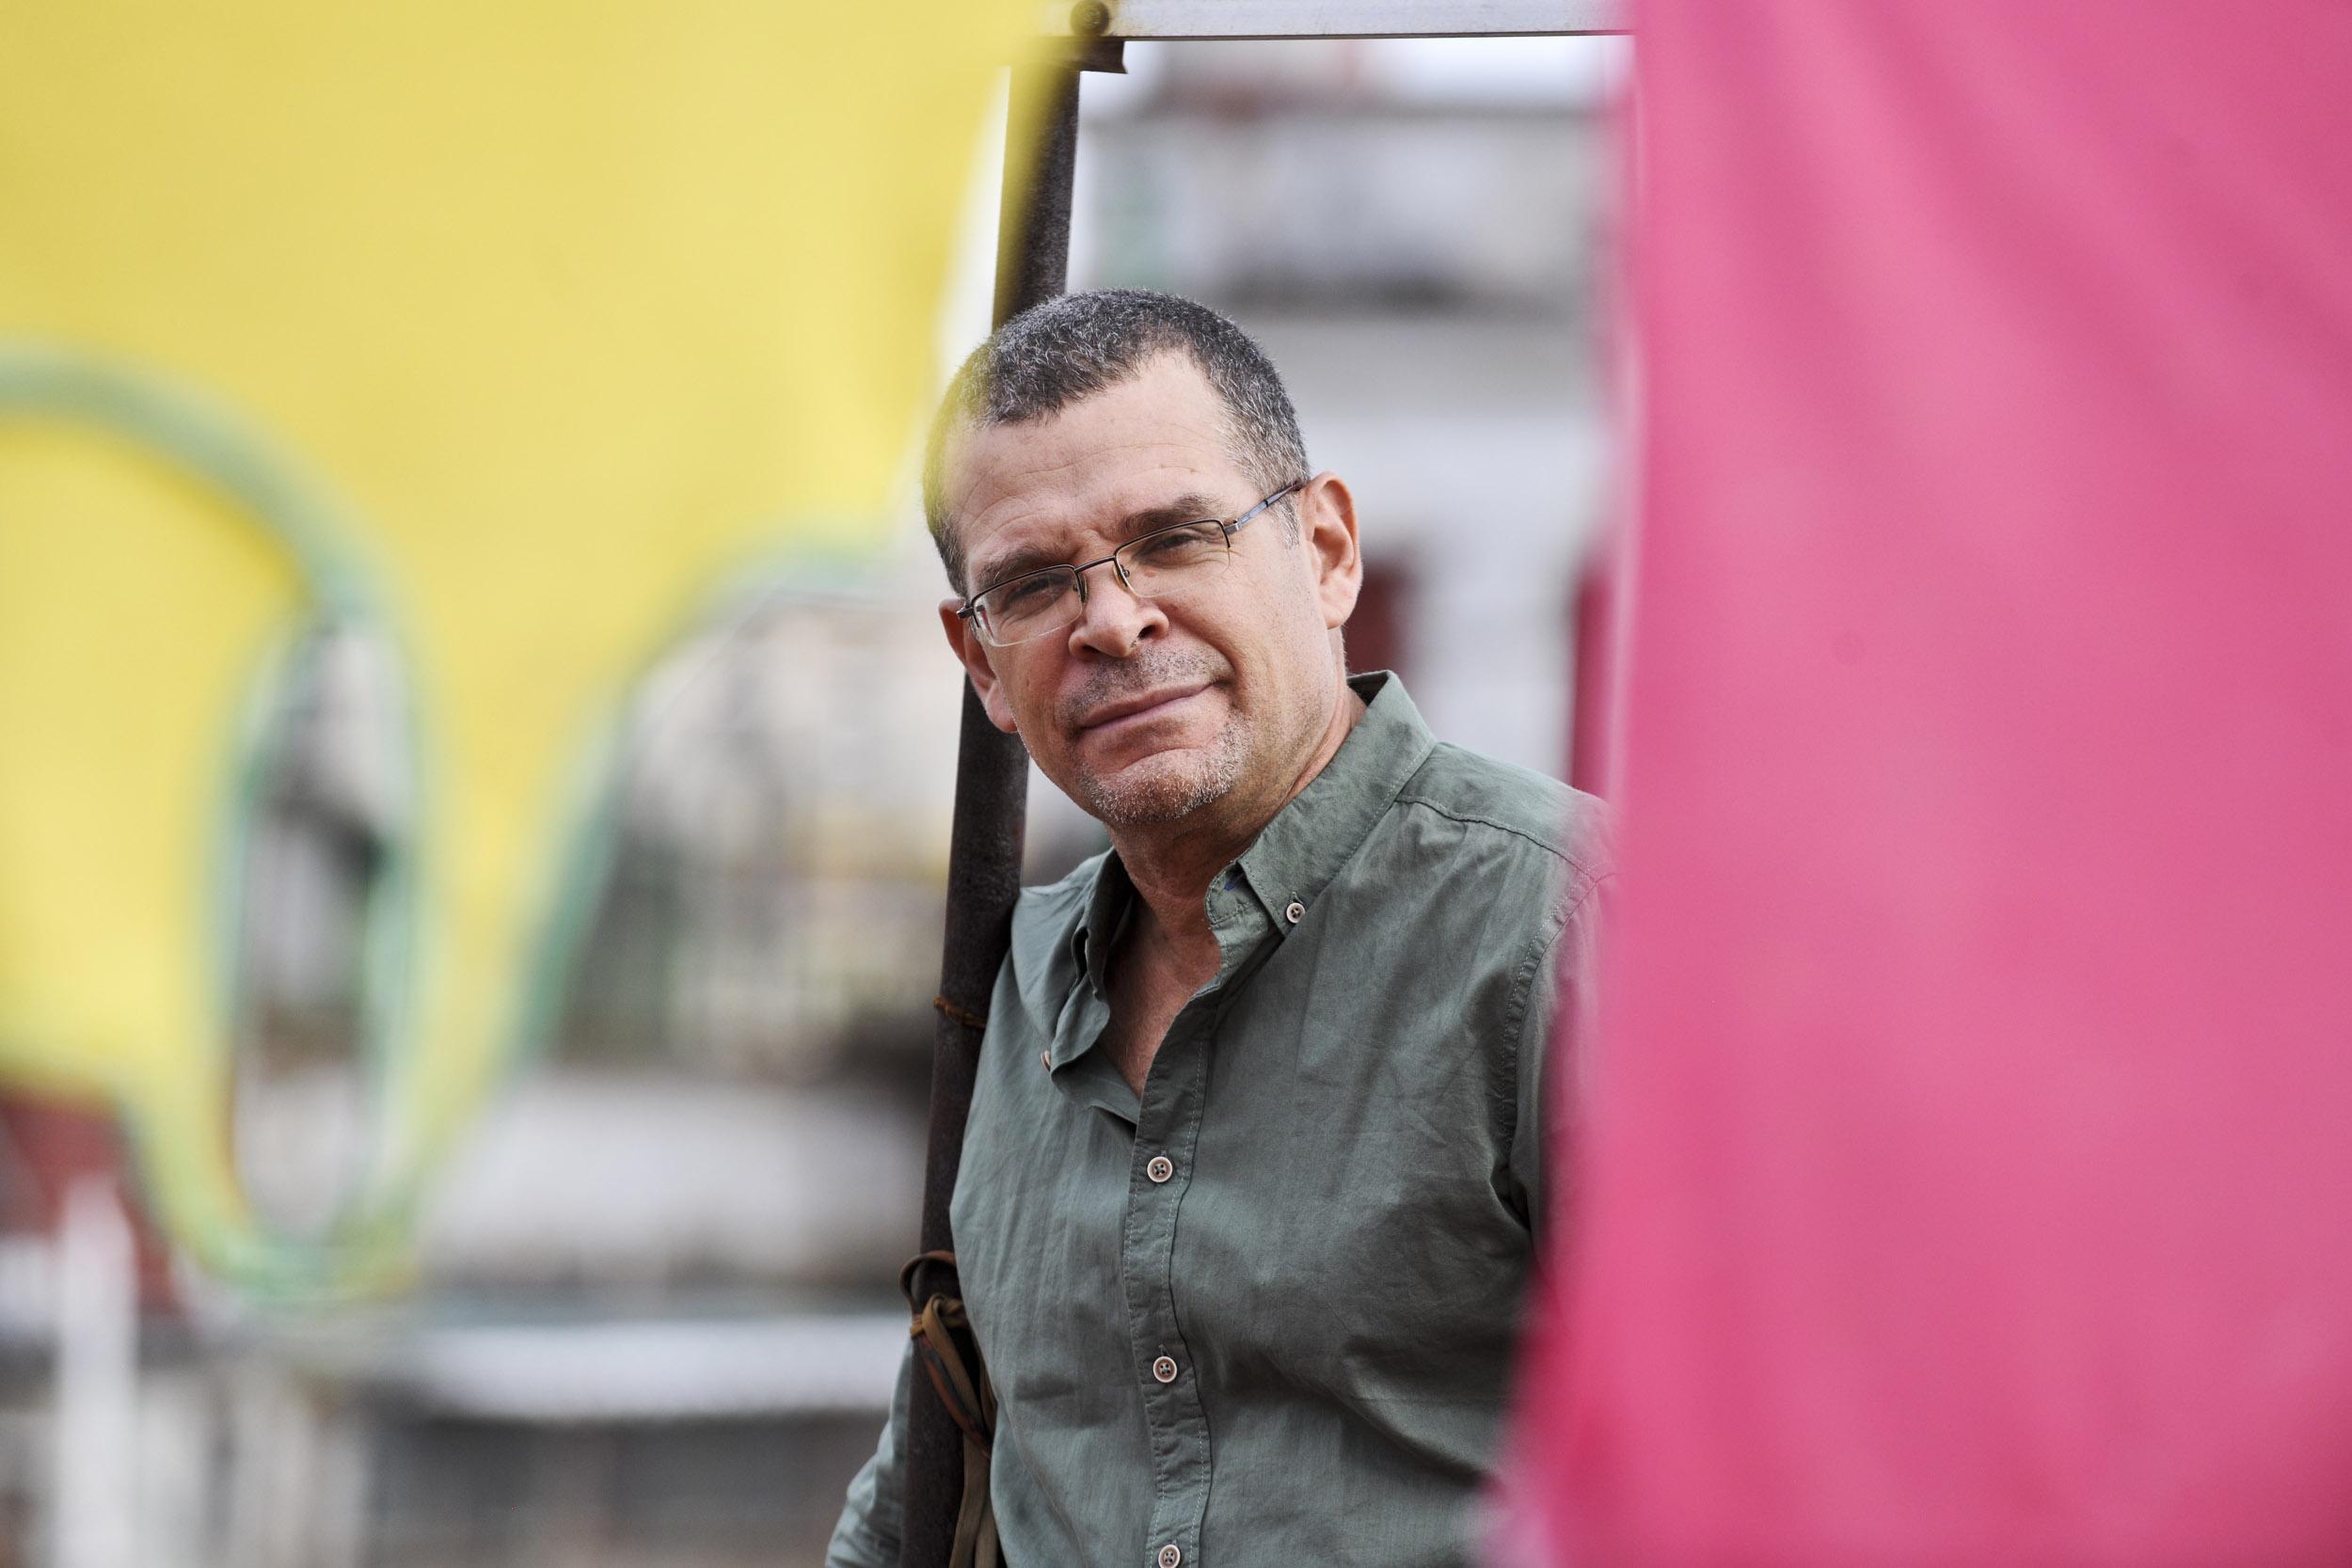 Ernesto Daranas, filmmaker - Illuminated Cuba - Hector Garrido, Aerial and human photography